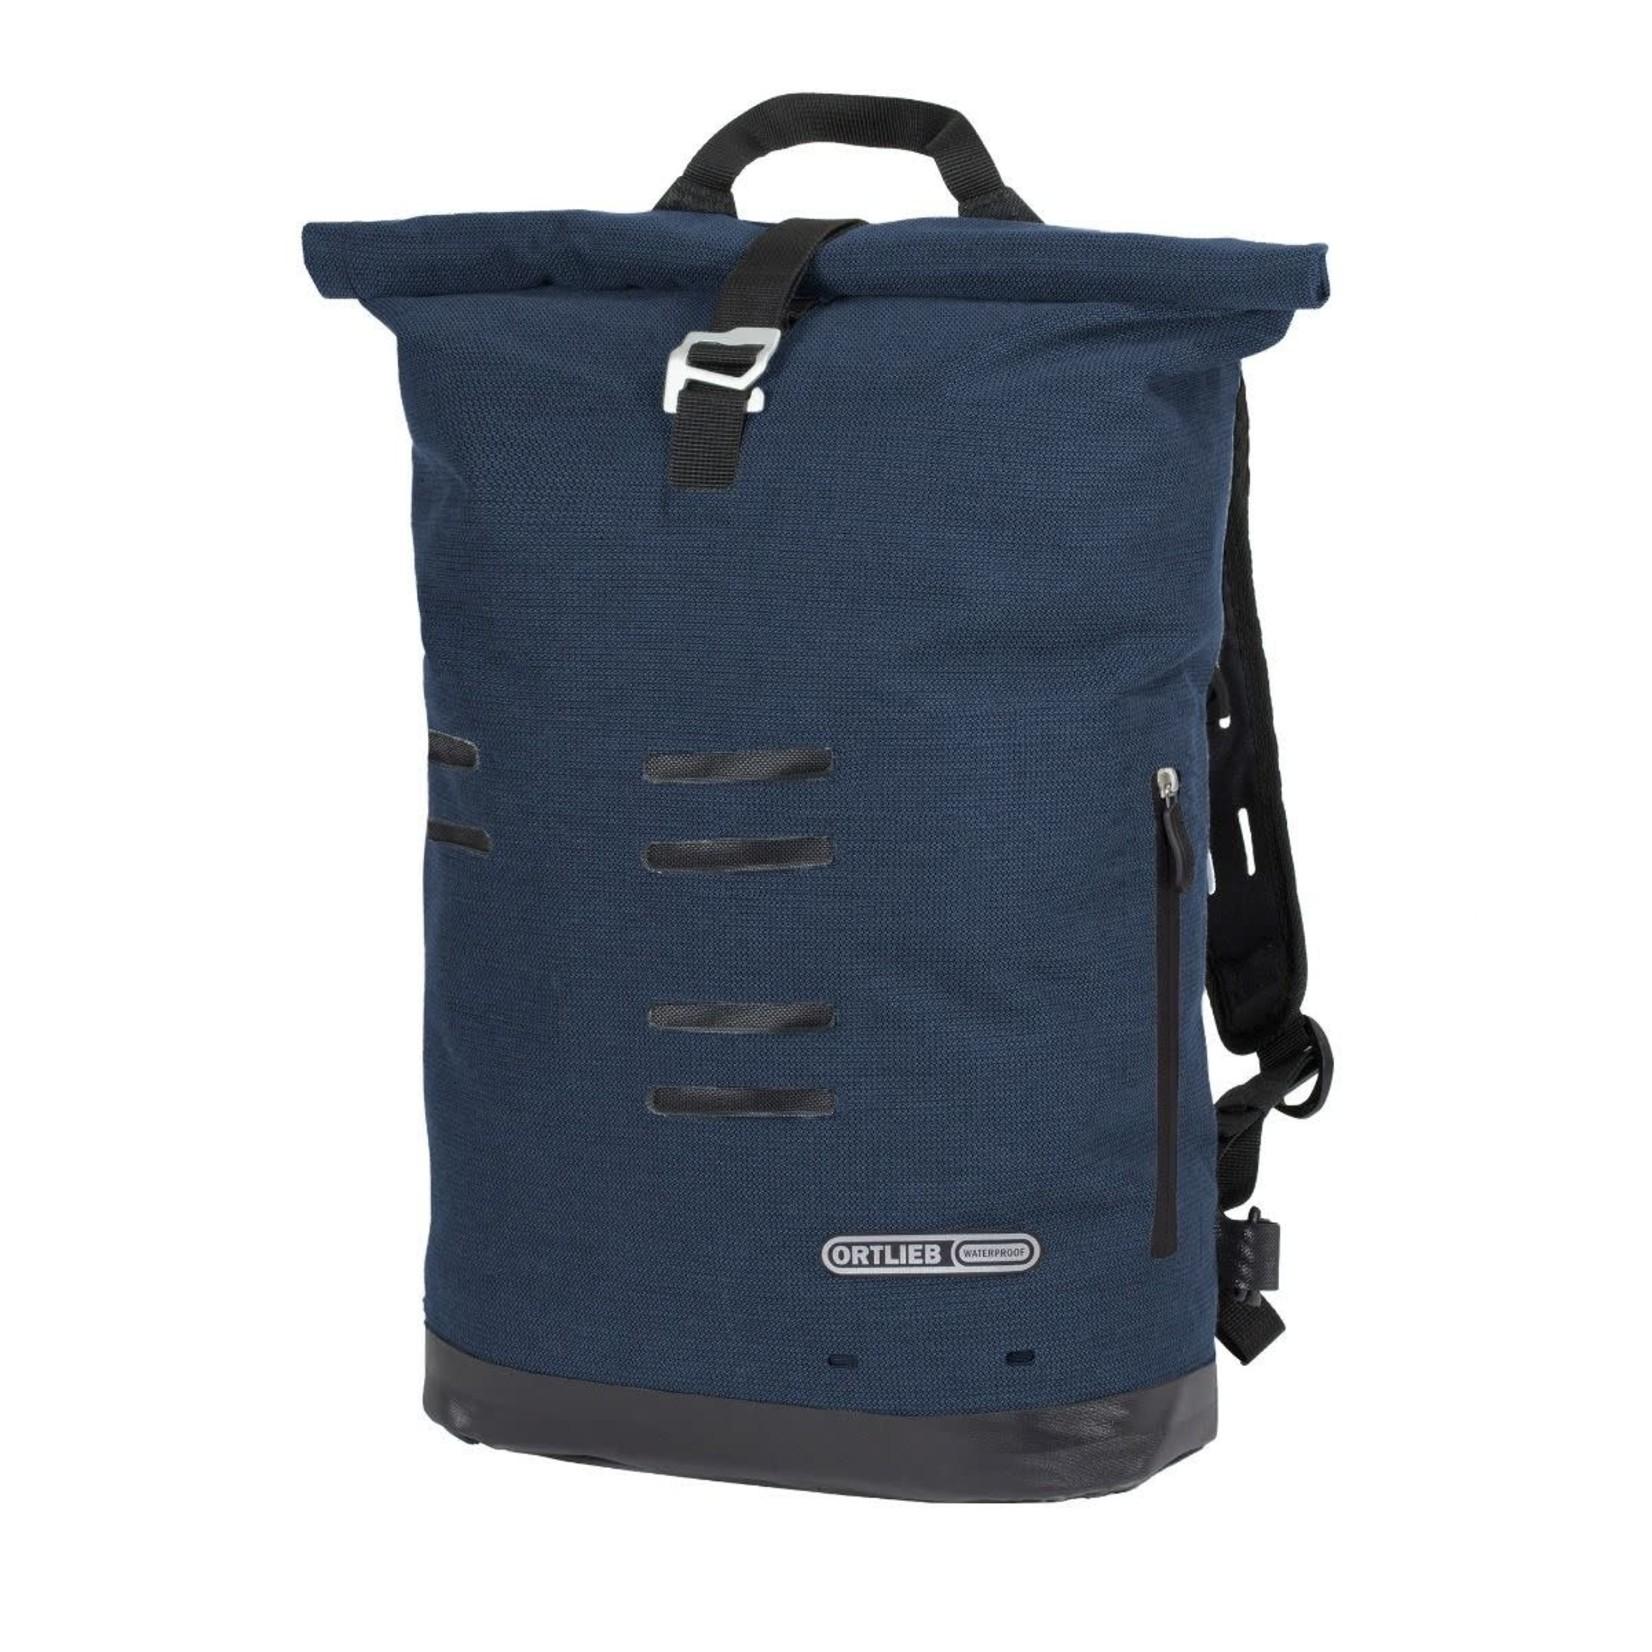 Ortlieb Ortlieb Urban Commuter Backpack